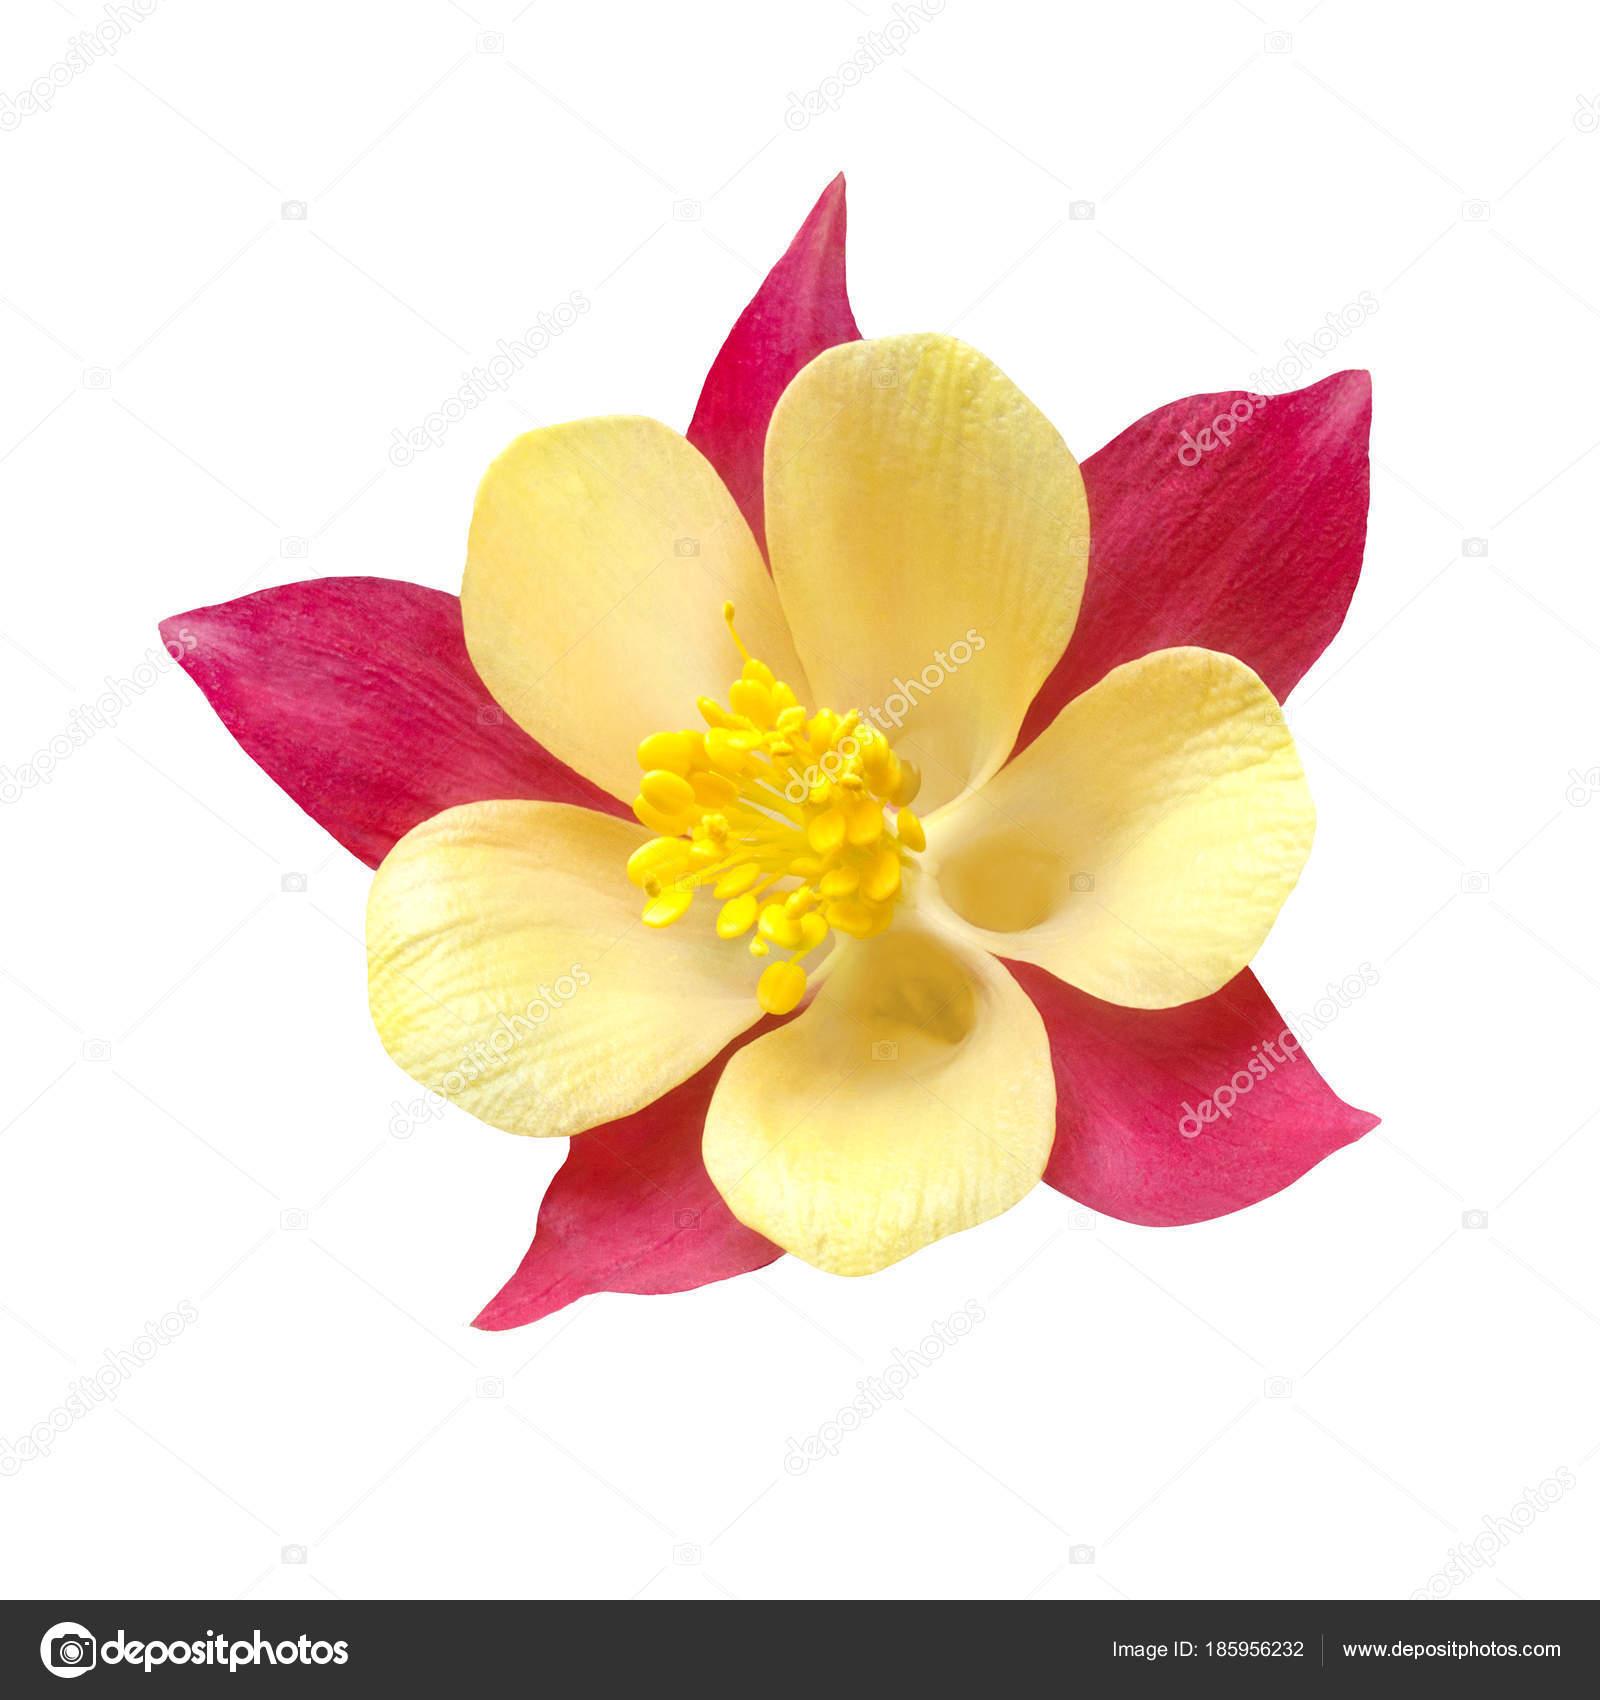 Желтый цветок похож на дельфиниум